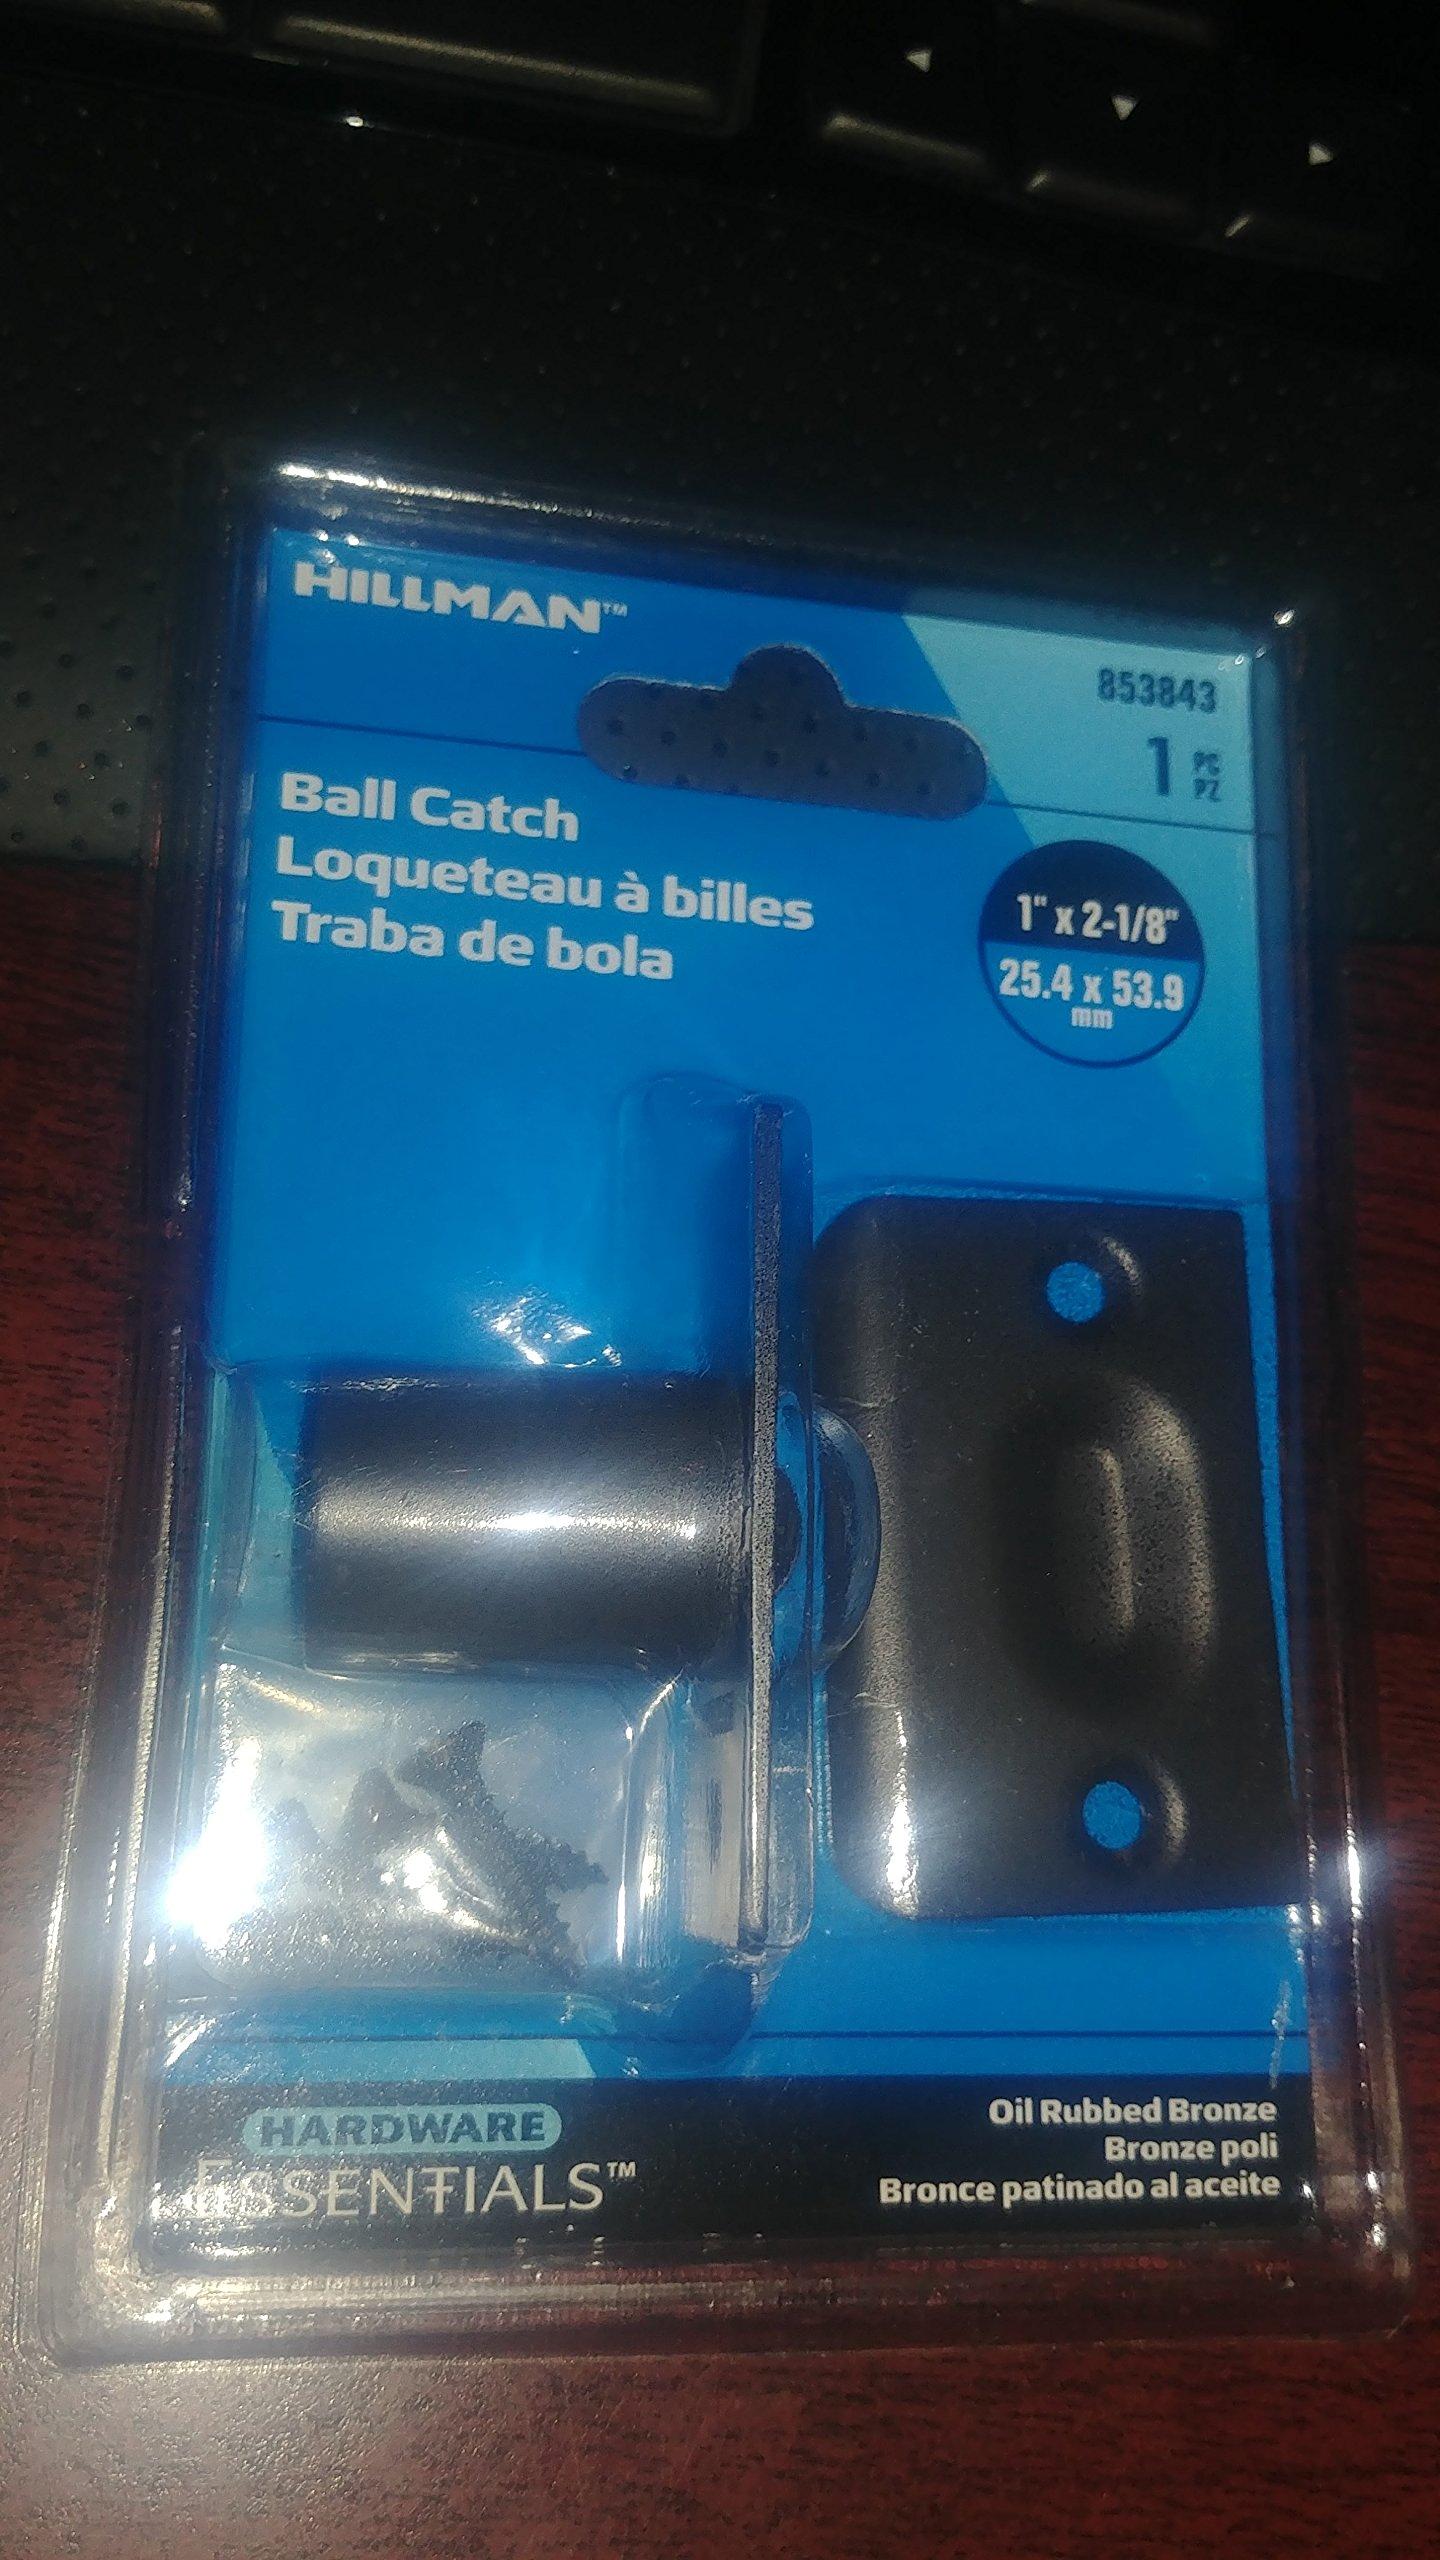 Hillman 1'' x 2-1/8'' Ball Catch 853843 Oil Rubbed Bronze